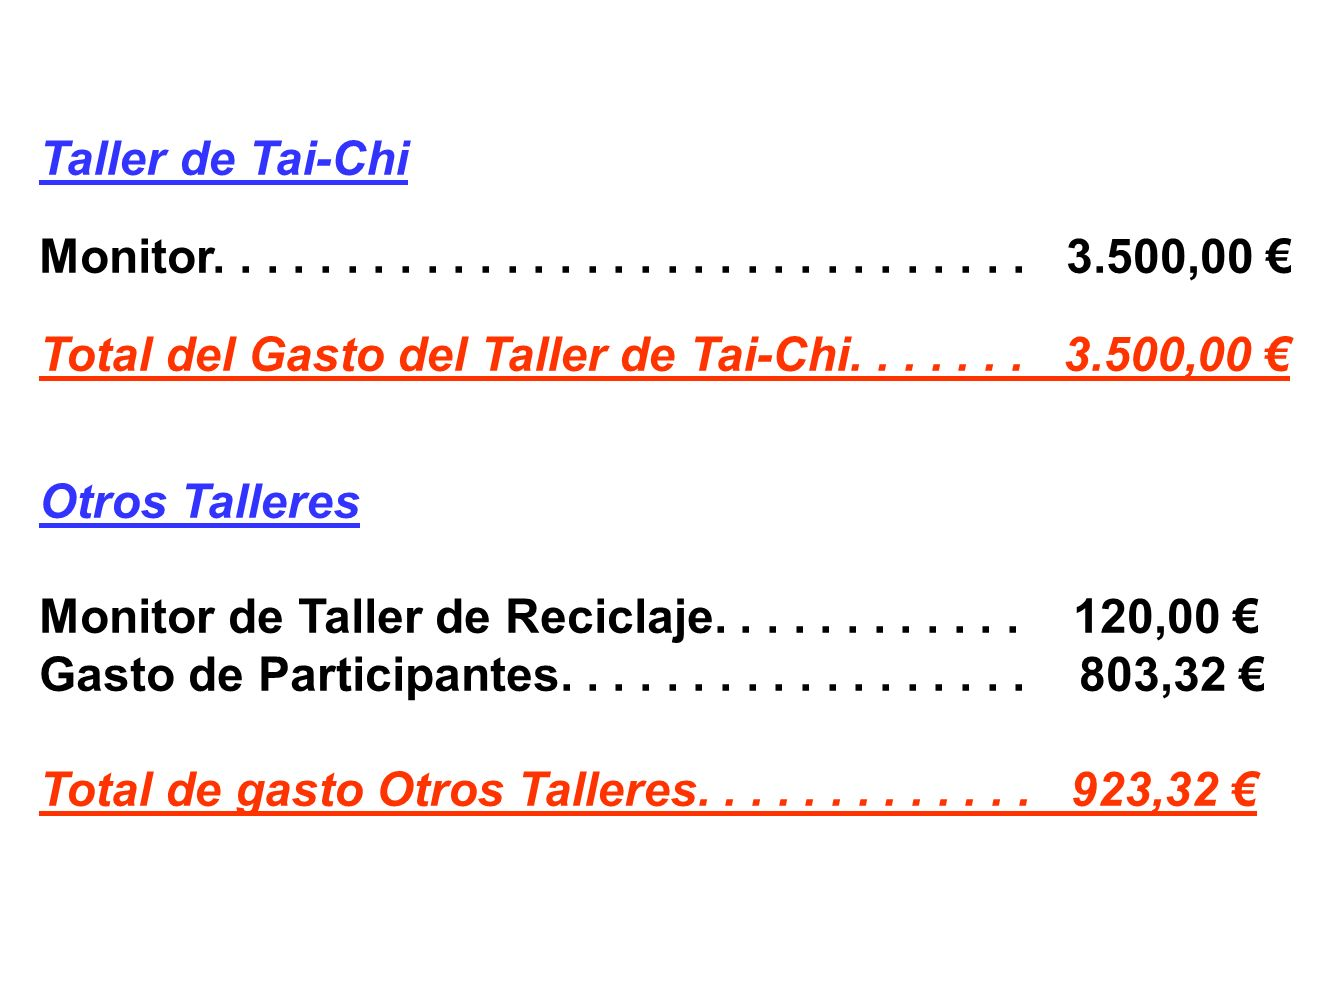 Taller de Tai-Chi Monitor. . . . . . . . . . . . . . . . . . . . . . . . . . . . . . . 3.500,00 €